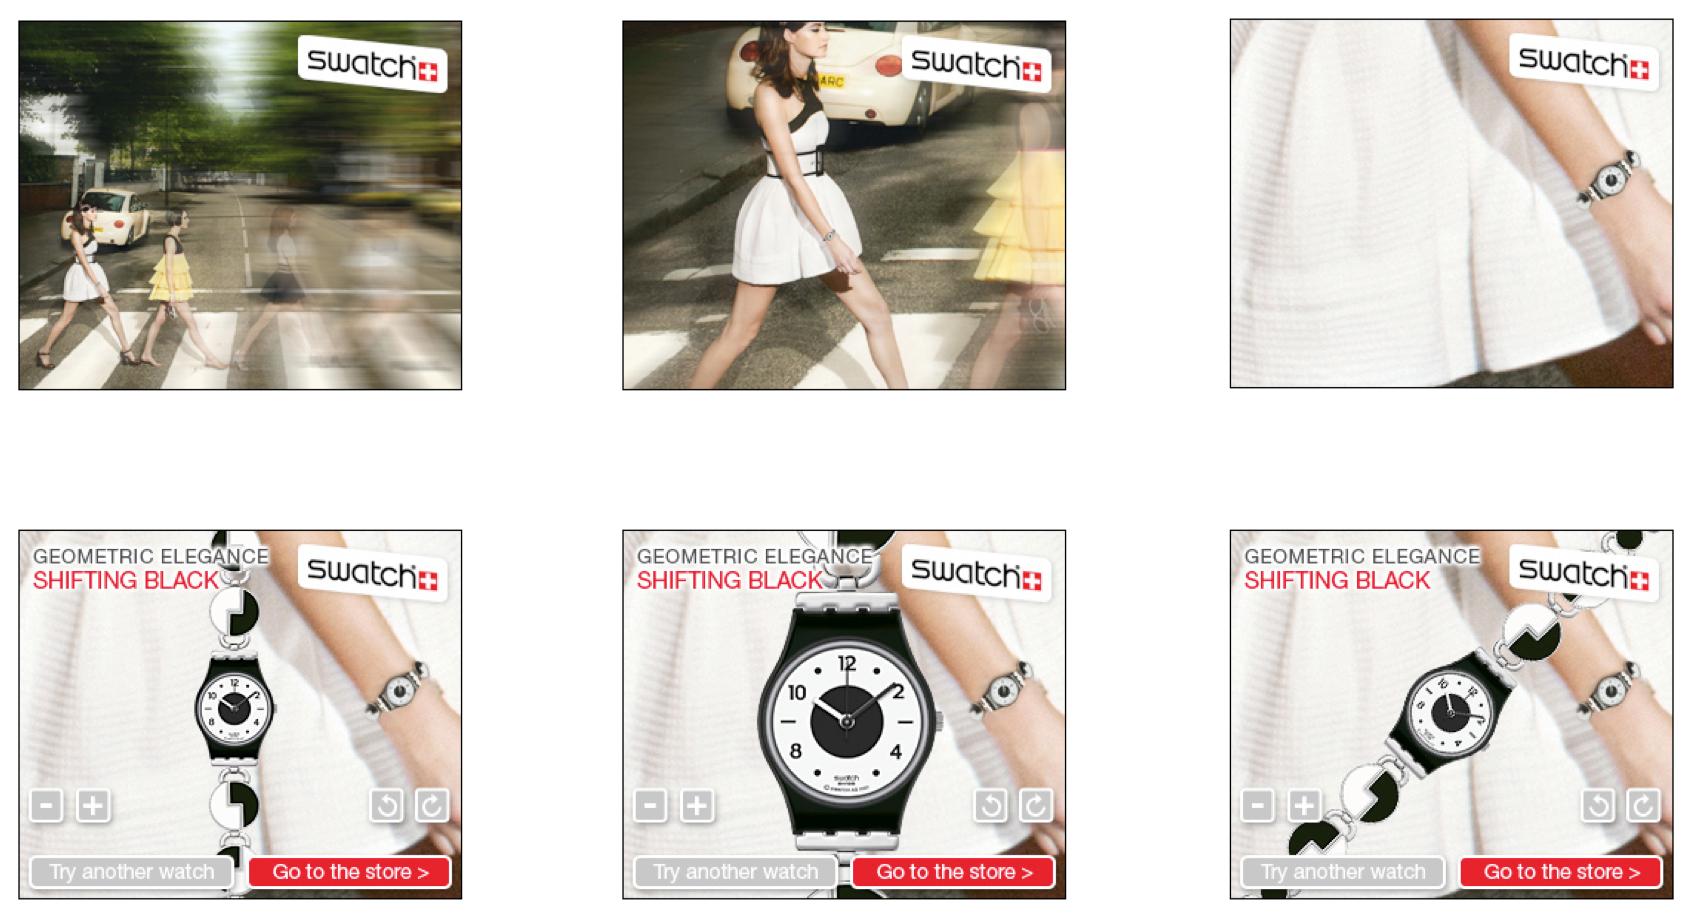 Swatch banner creative - Advertising - Web Design in Farnborough